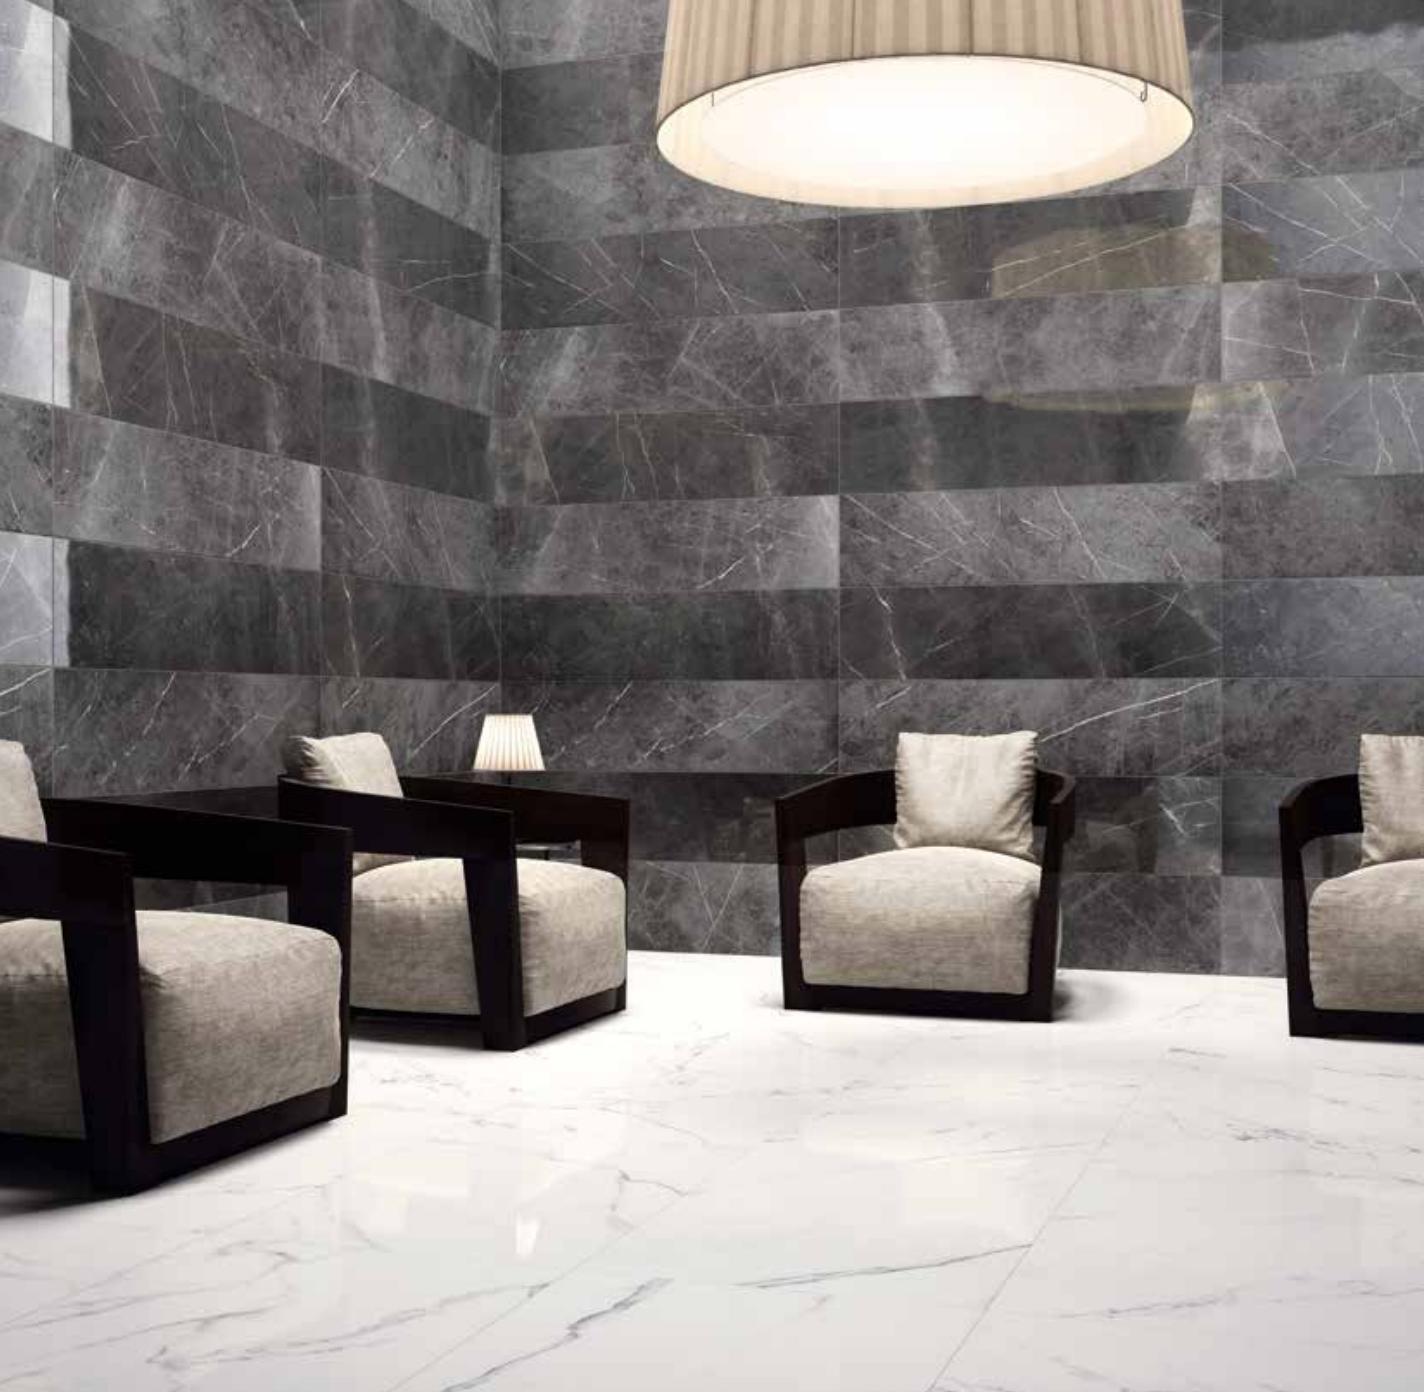 Porcelain_flooring-natural_stone.png